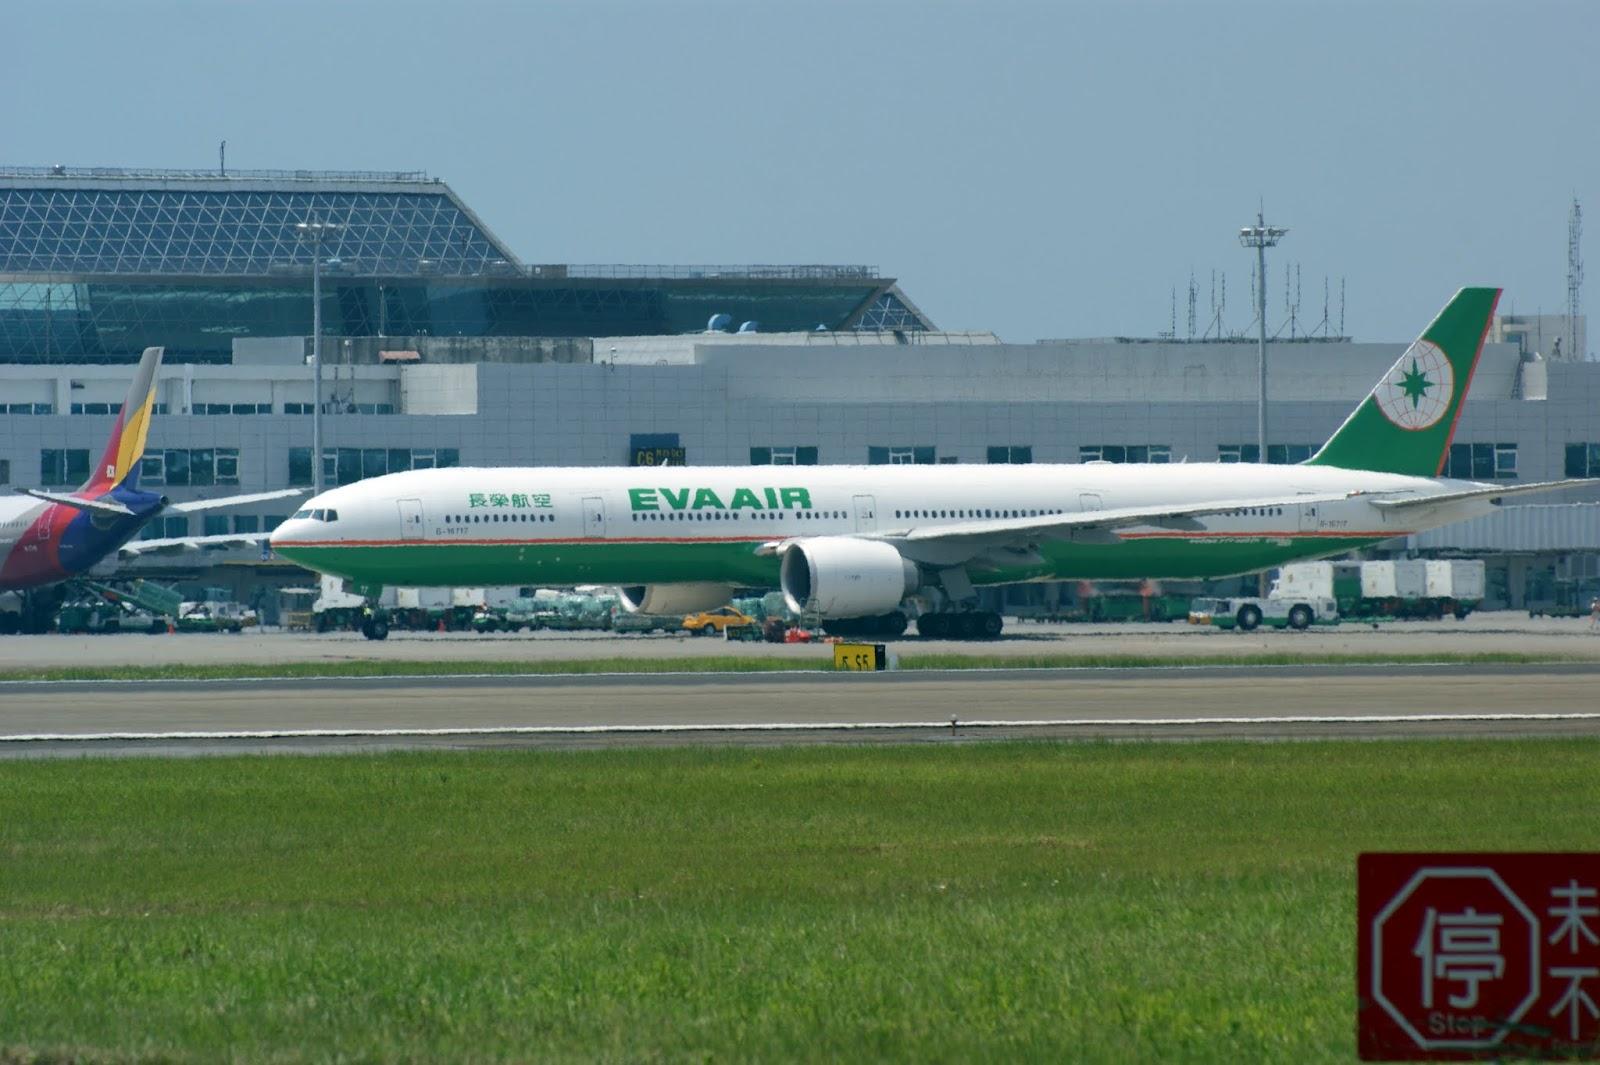 長榮航空 EVA AIR B-16717 777-300ER